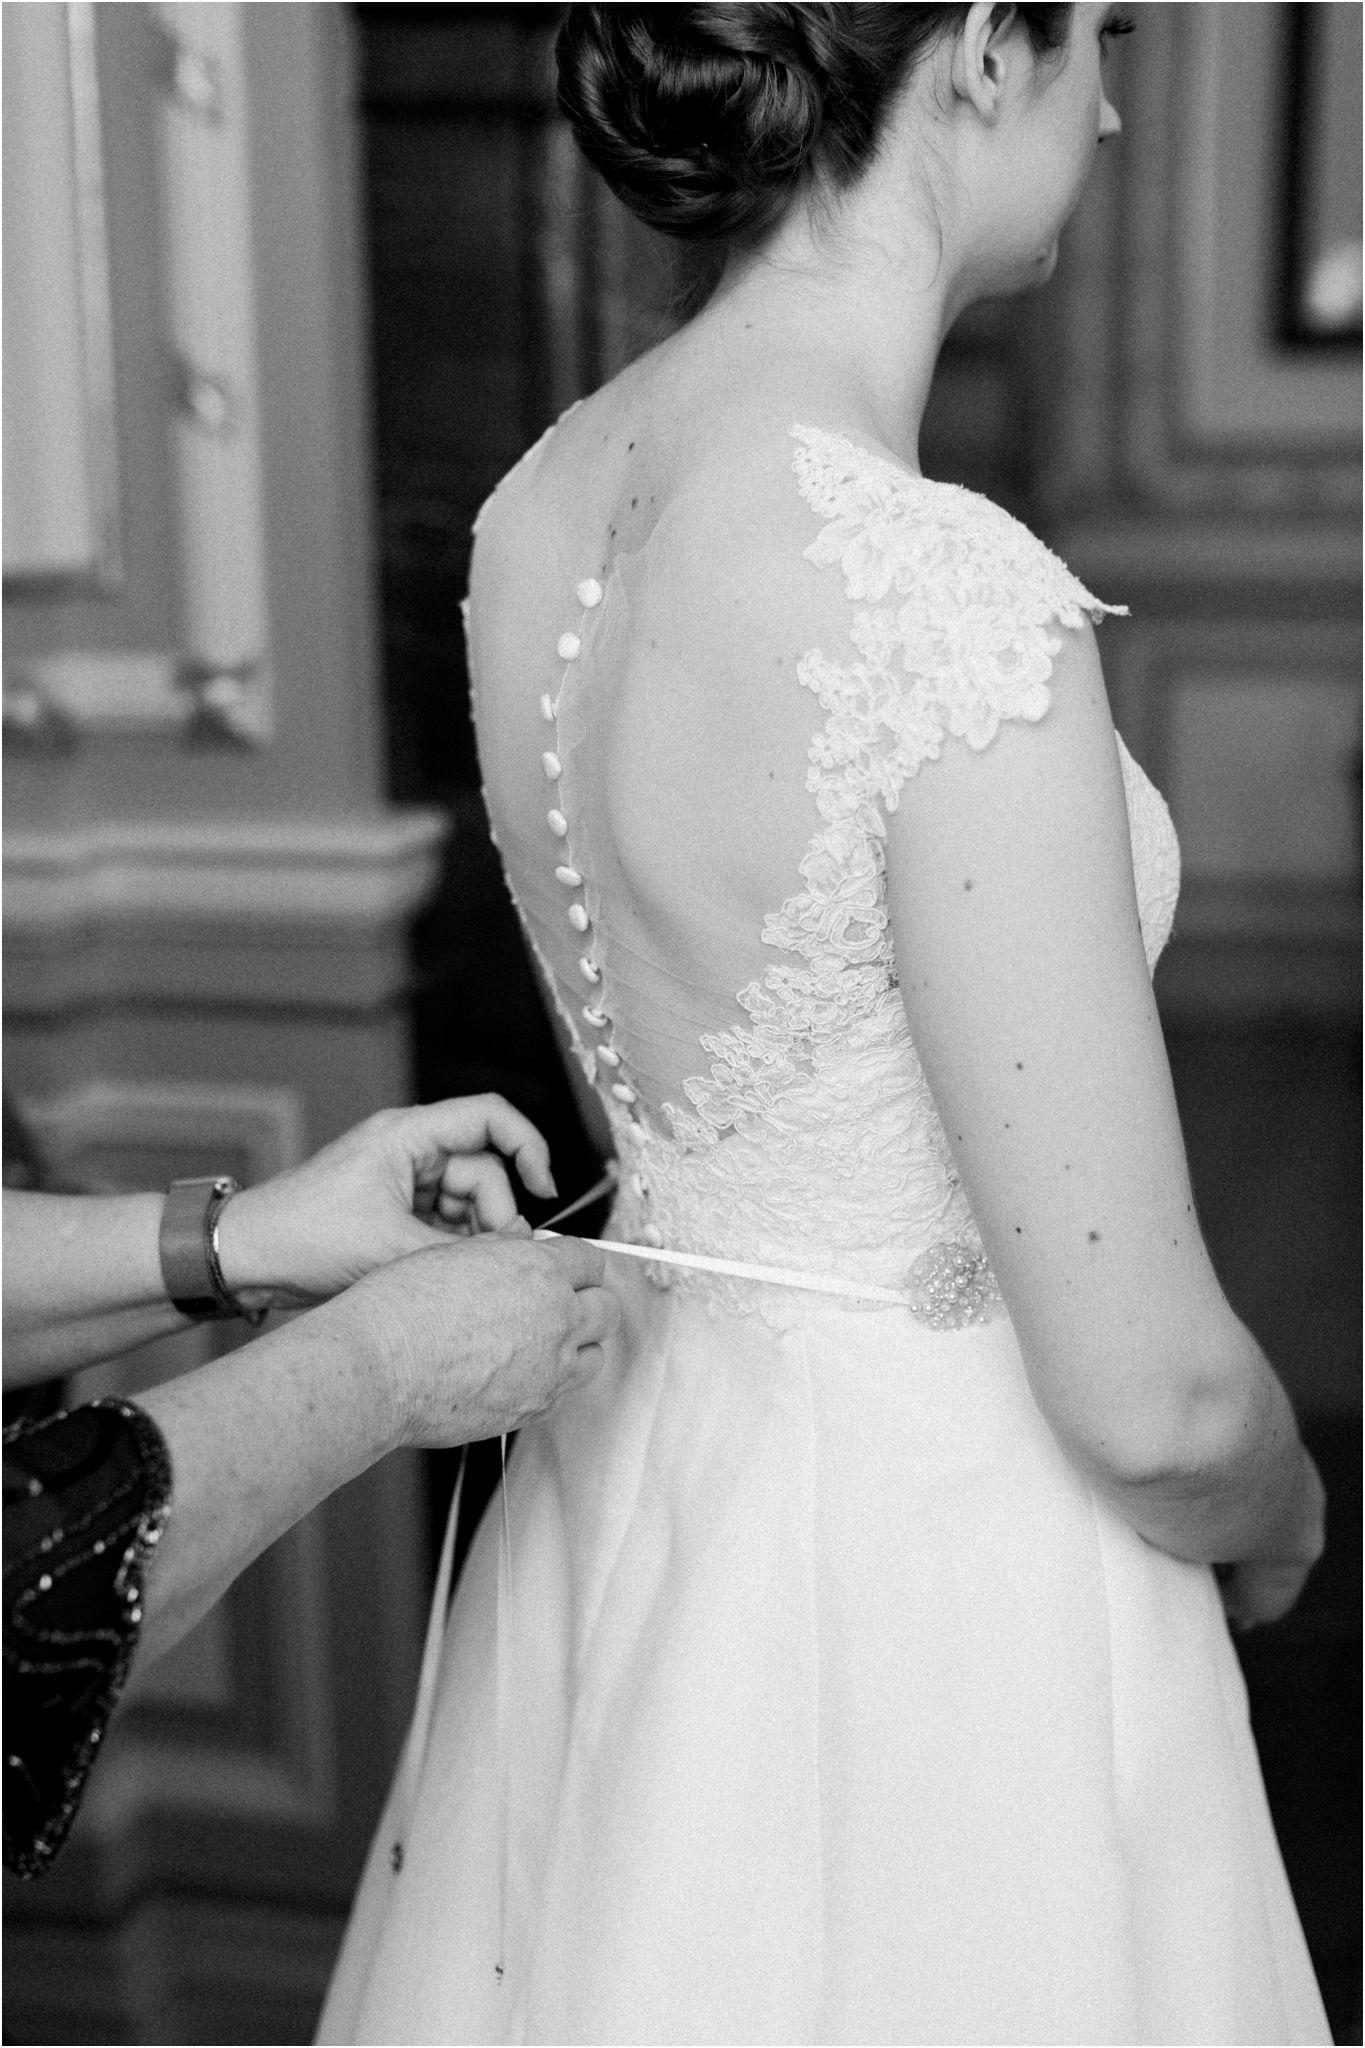 providence-public-library-wedding-images_00003.JPG